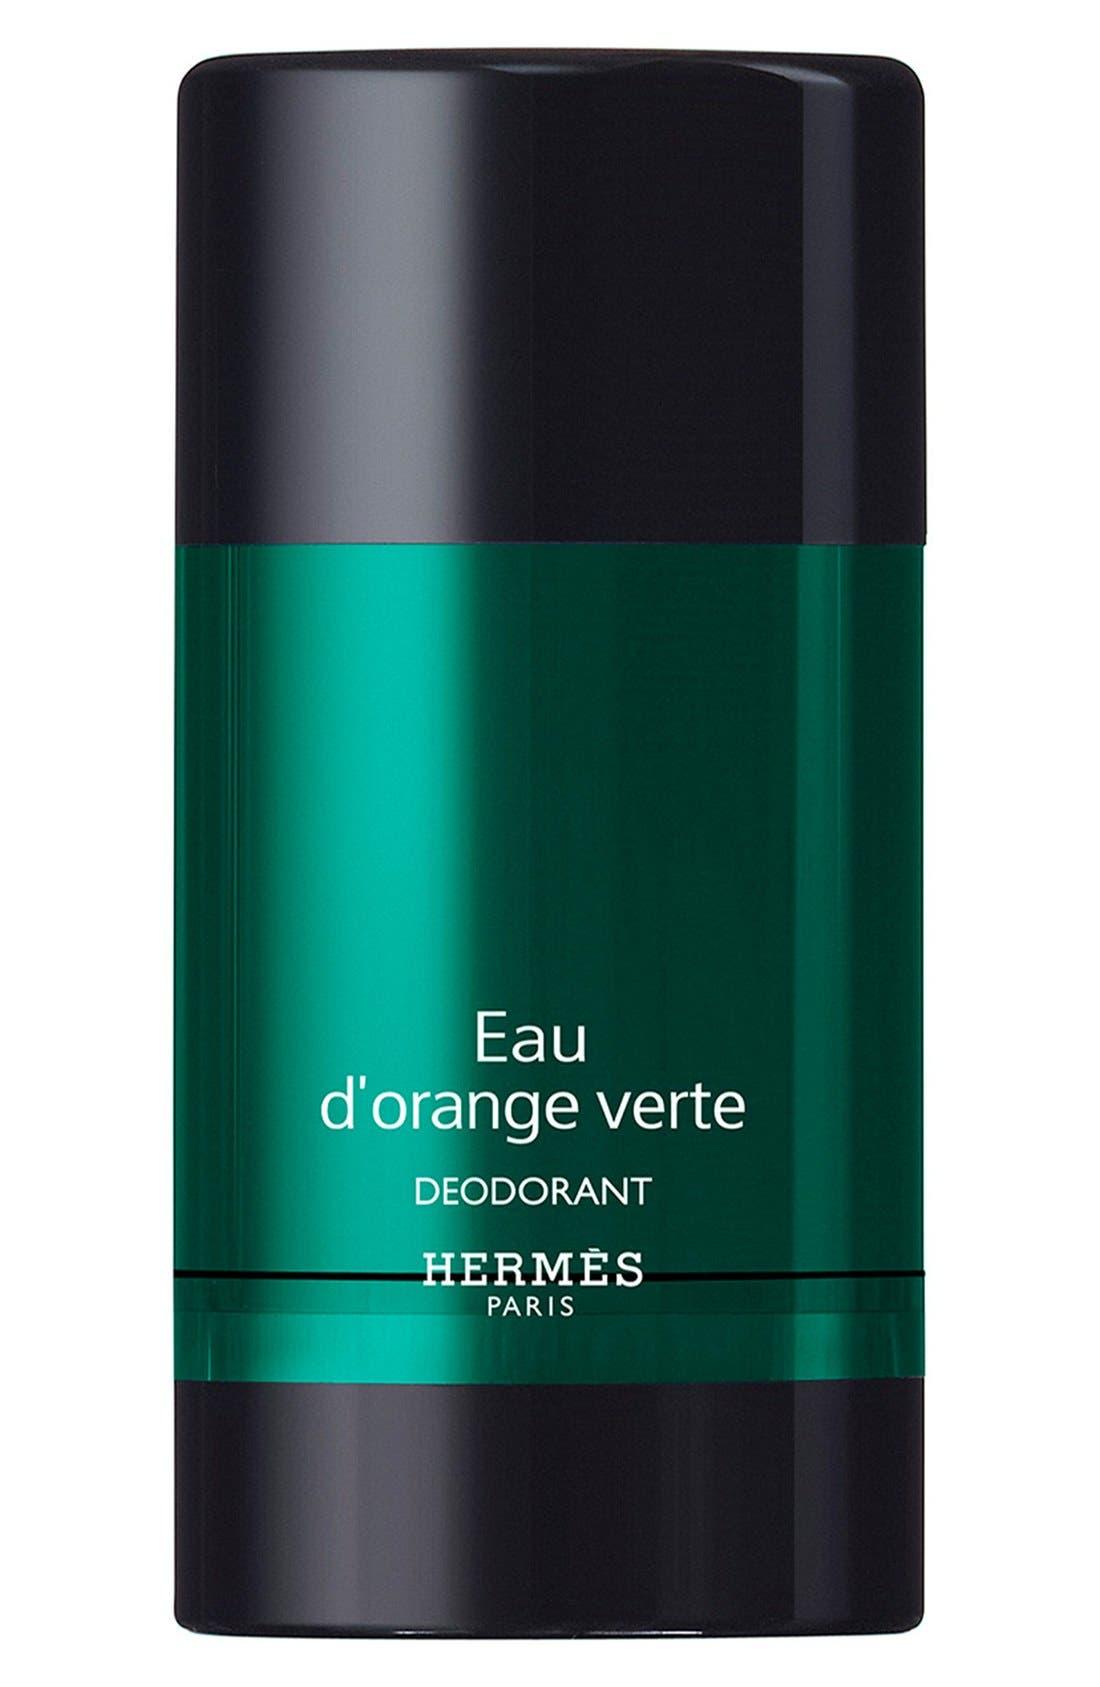 Hermès Eau d'orange verte - Alcohol-free deodorant stick